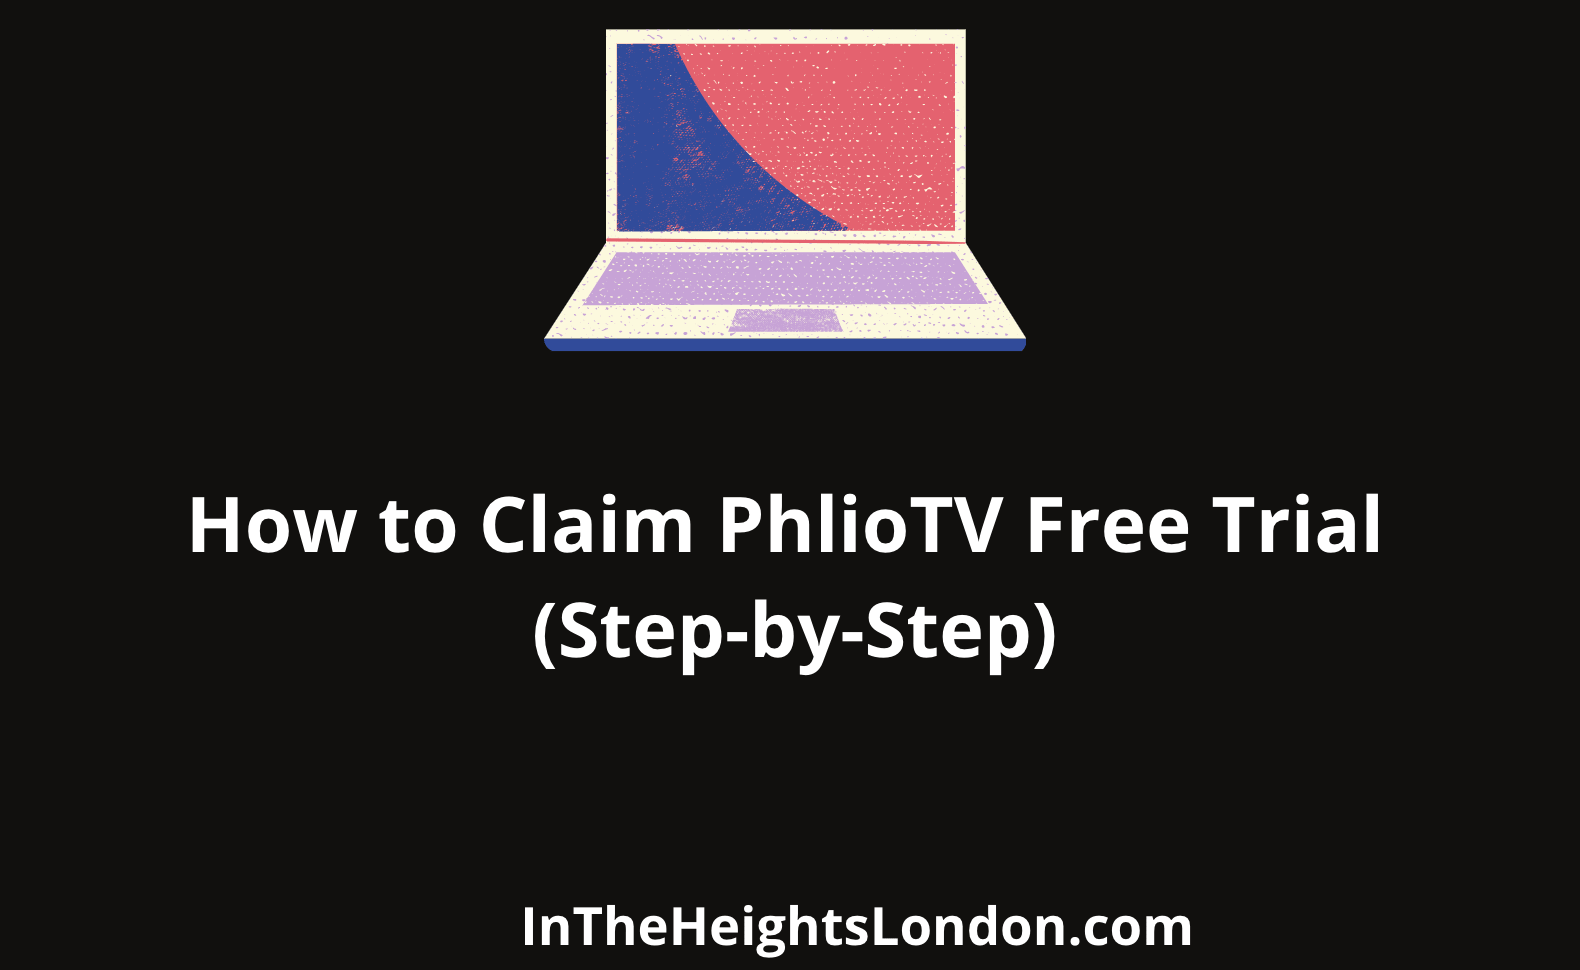 PhiloTV Free Trial